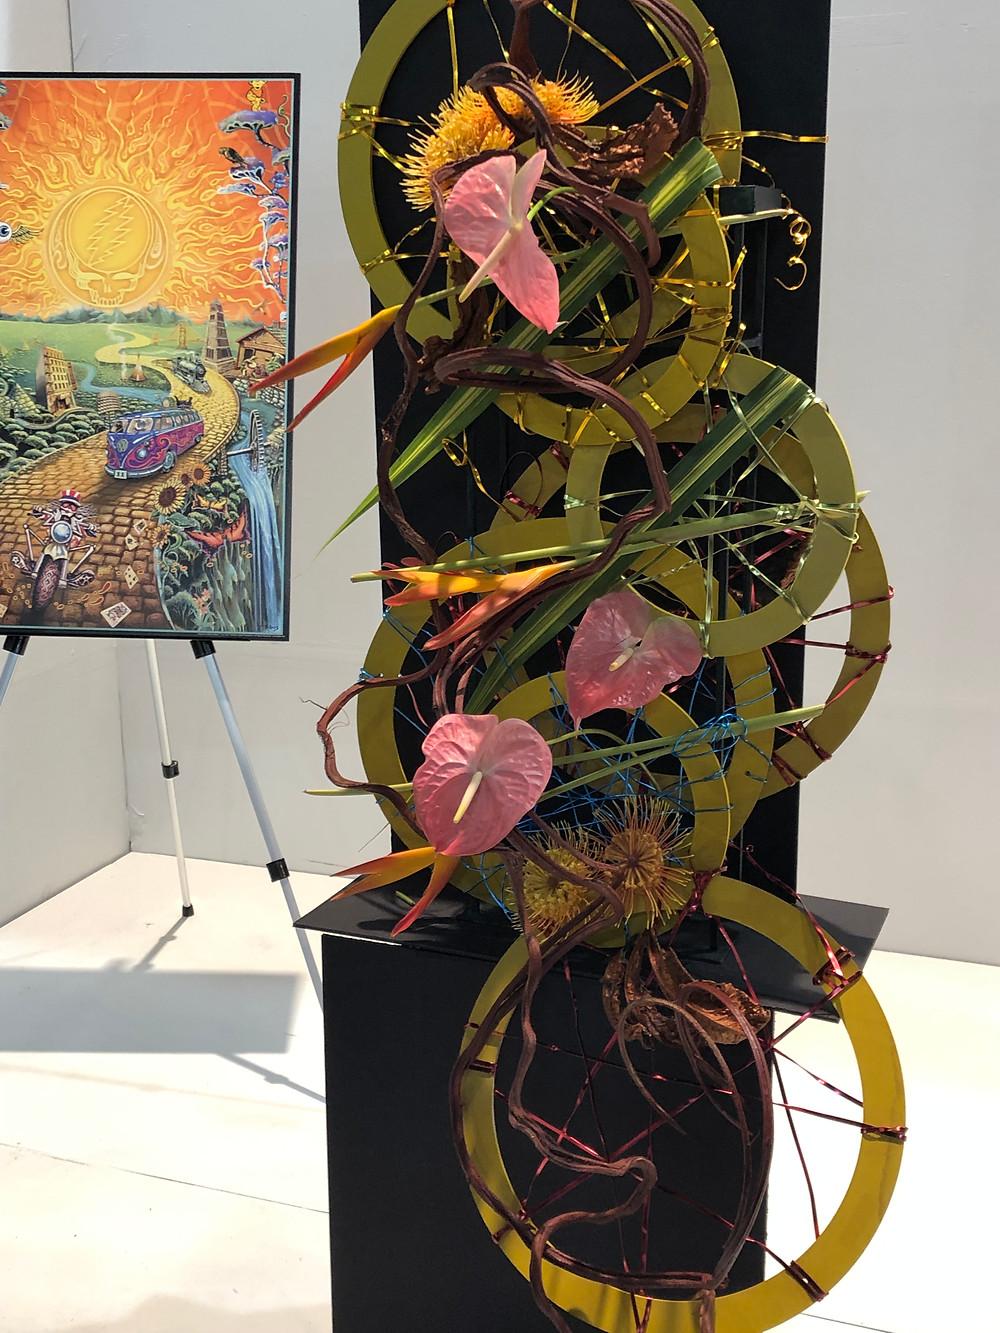 First prize floral arrangement interpretting Album Cover Art